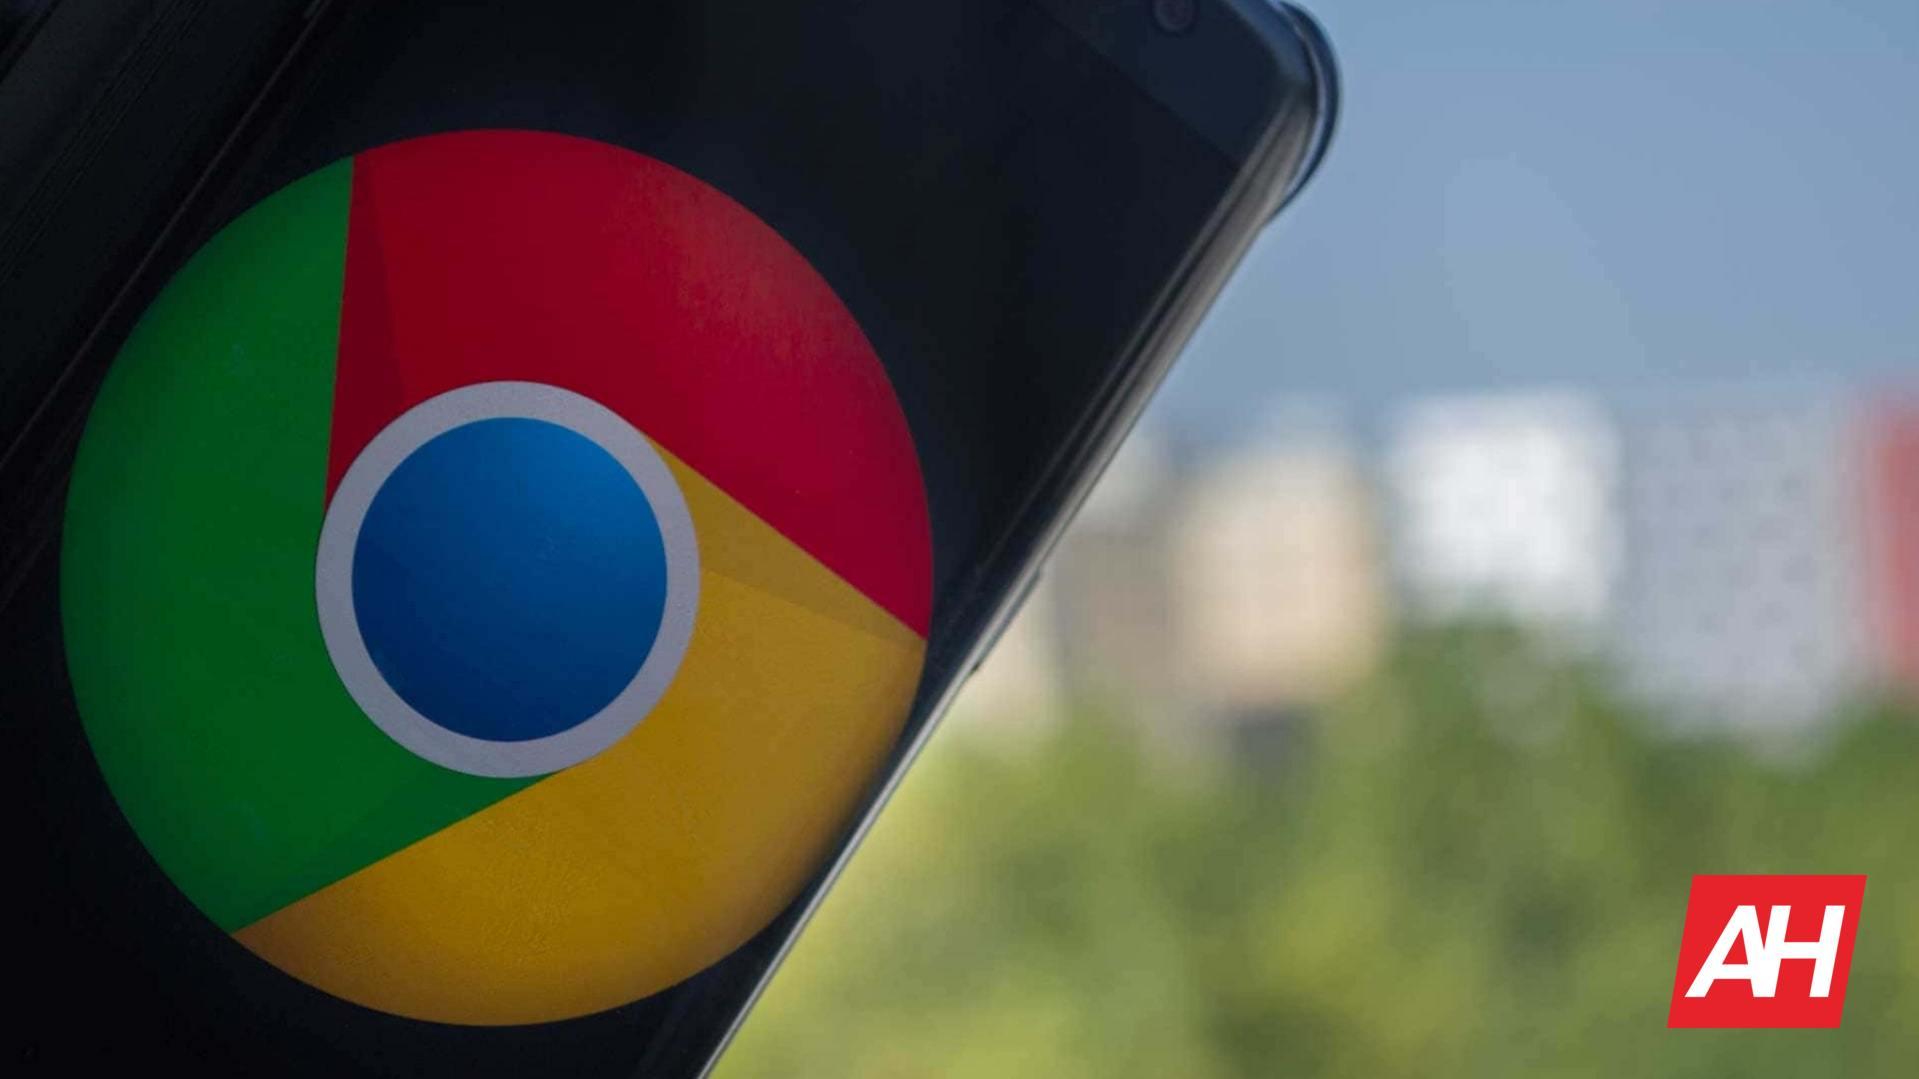 Chrome 71 Beta Brings Speed & Resource Improvements